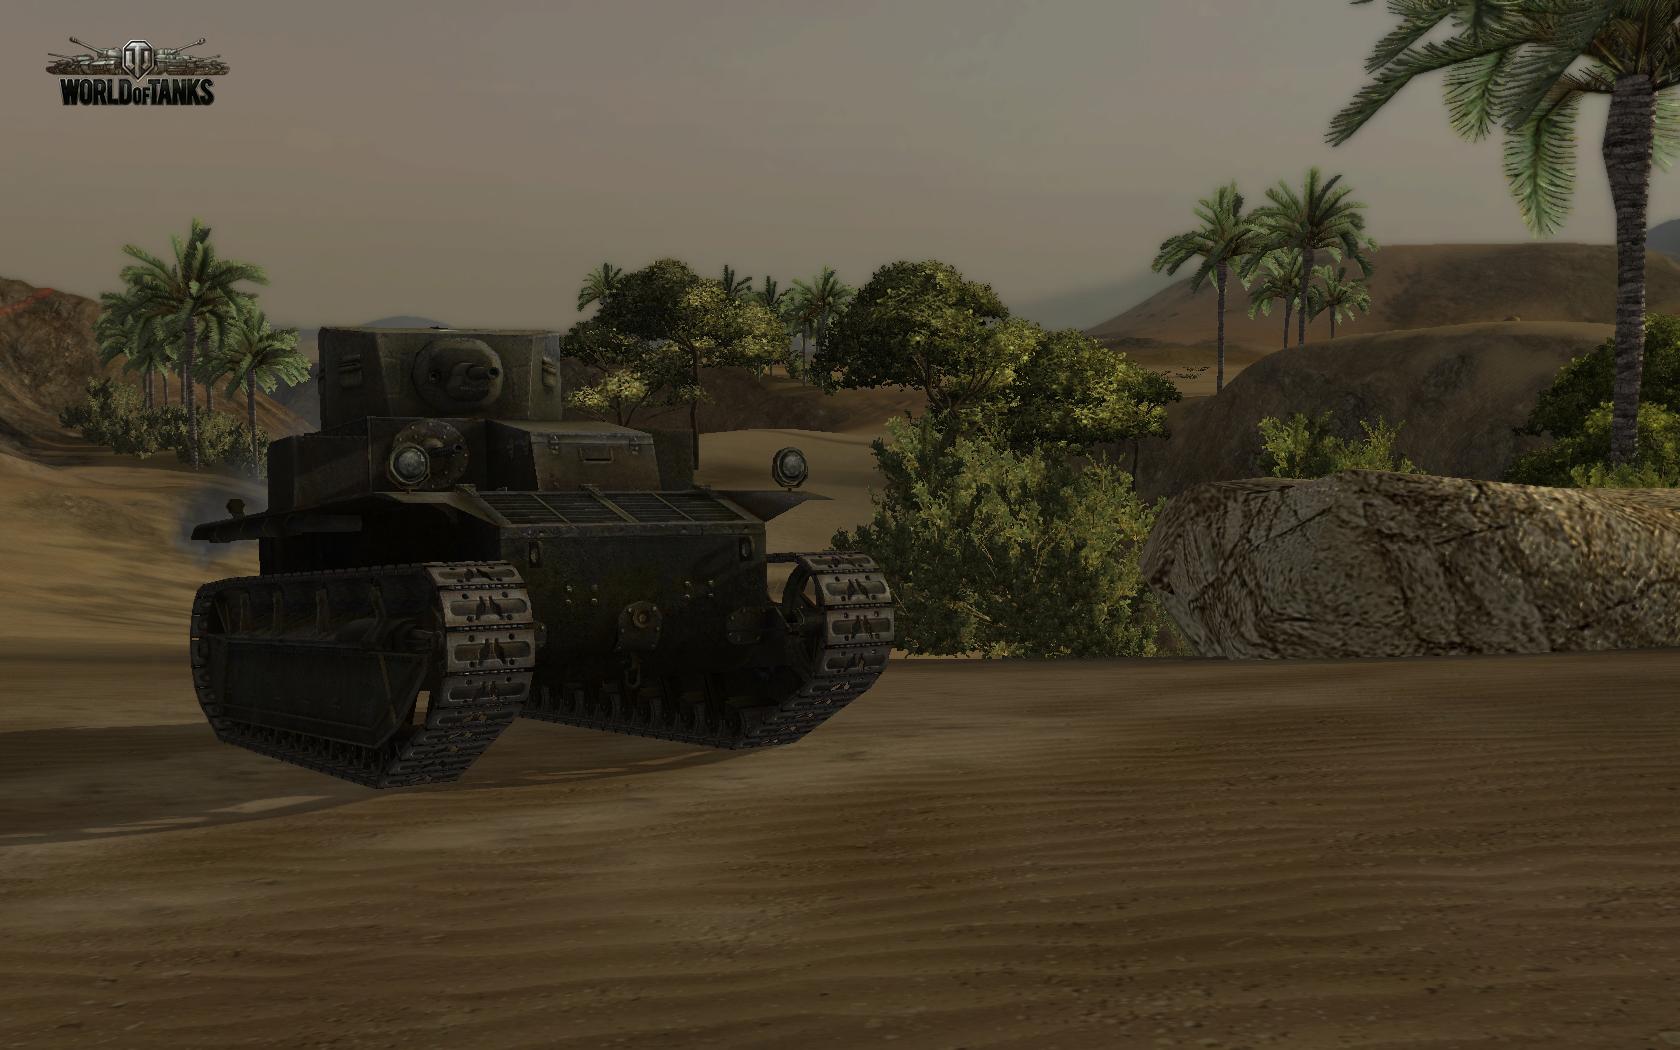 Click image for larger version.Name:World of Tanks 33.jpgViews:188Size:992.1 KBID:1620